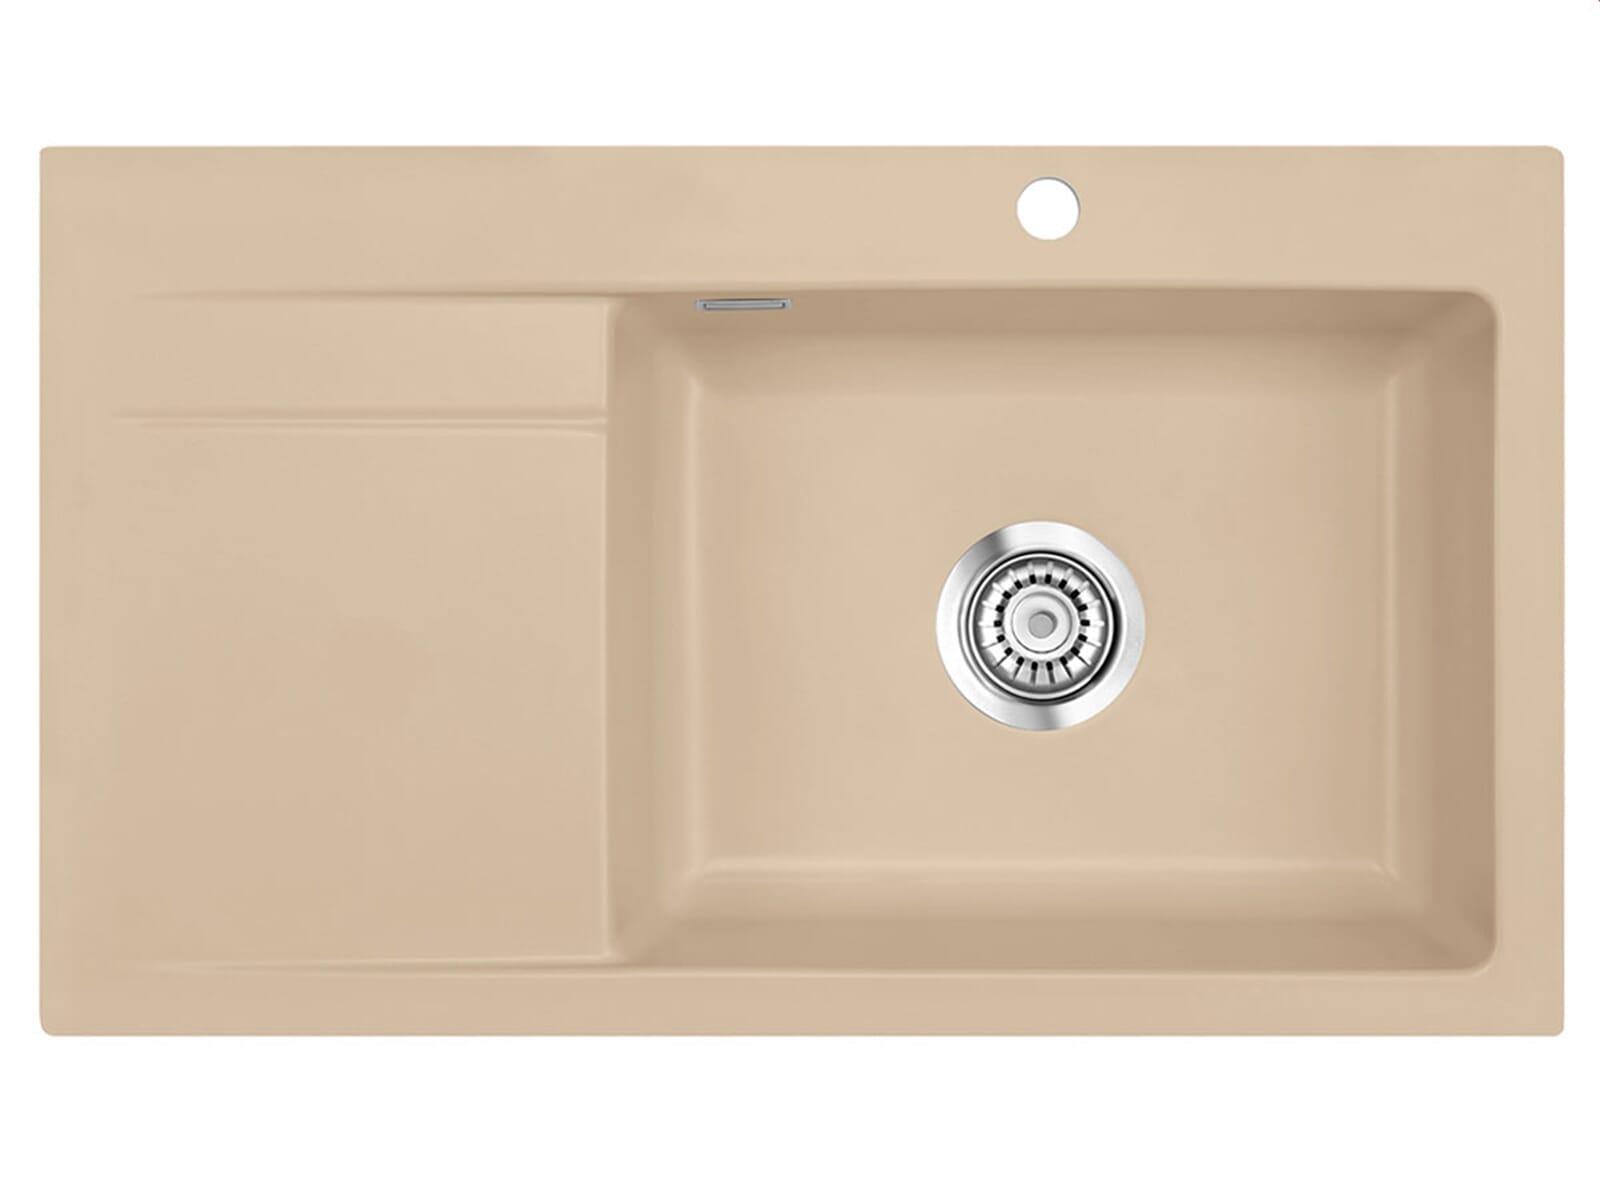 Systemceram Stema 86 SL Sand Keramikspüle Handbetätigung